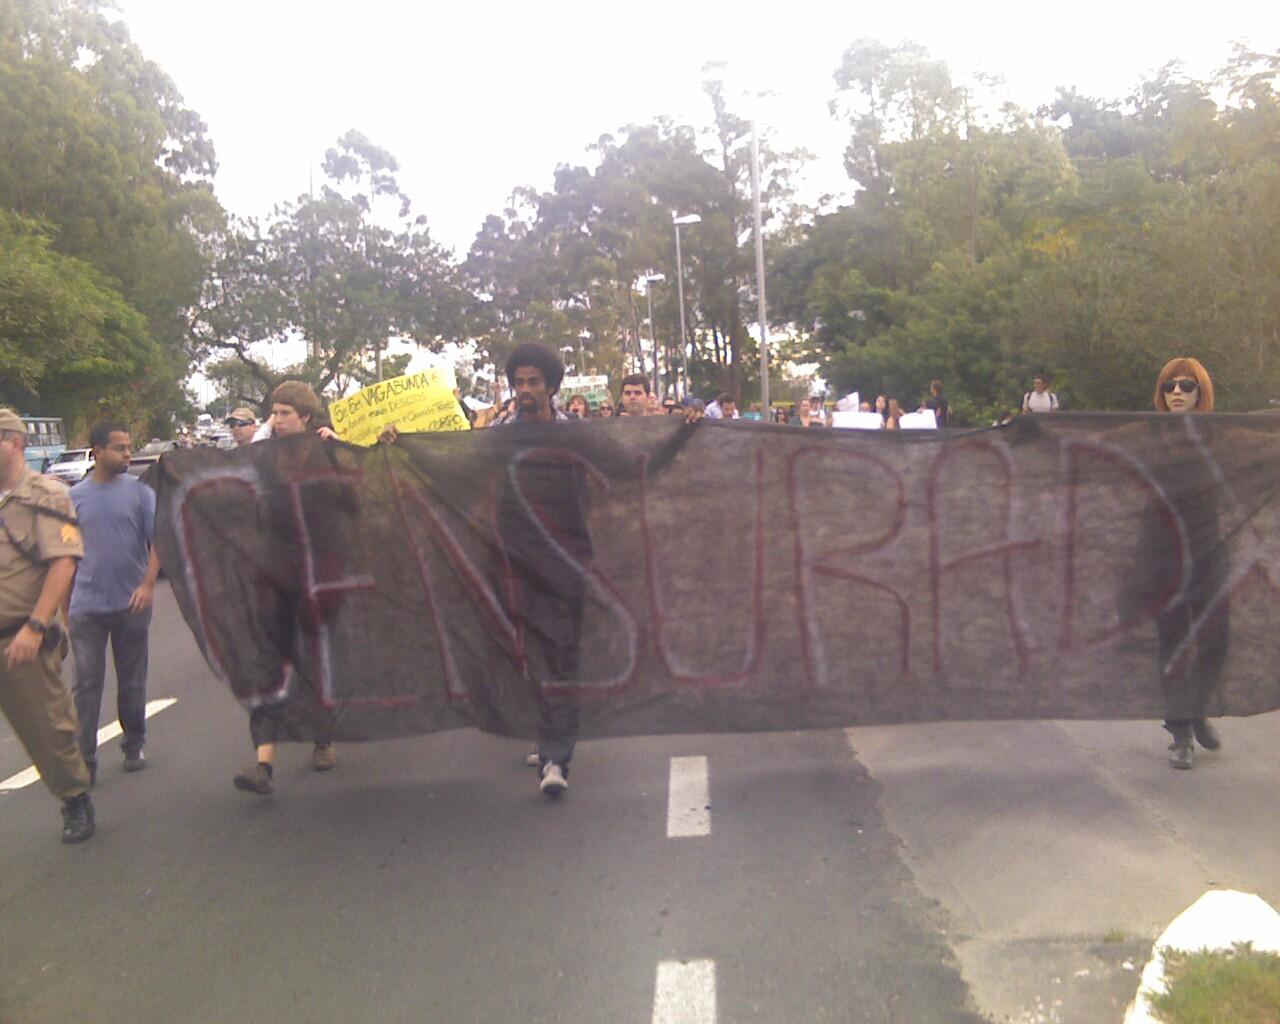 """censuradoXs"" #MarchadaLiberdade em #Floripa"